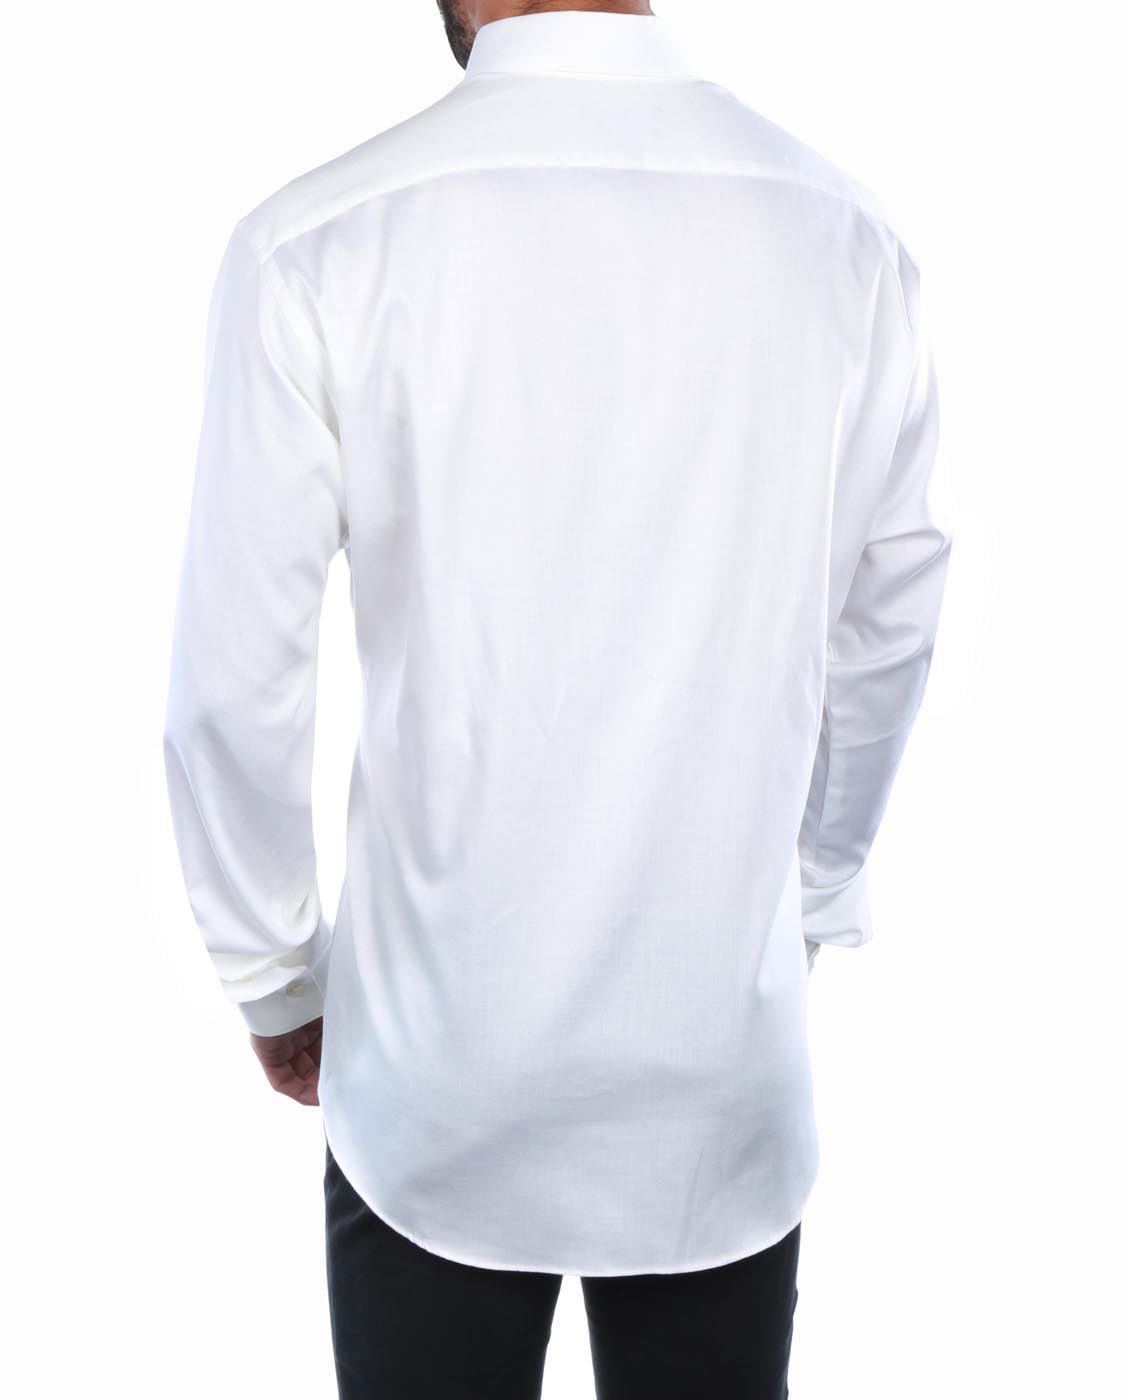 Geoffrey Beene Fitted Sateen Shirts Summer Cook